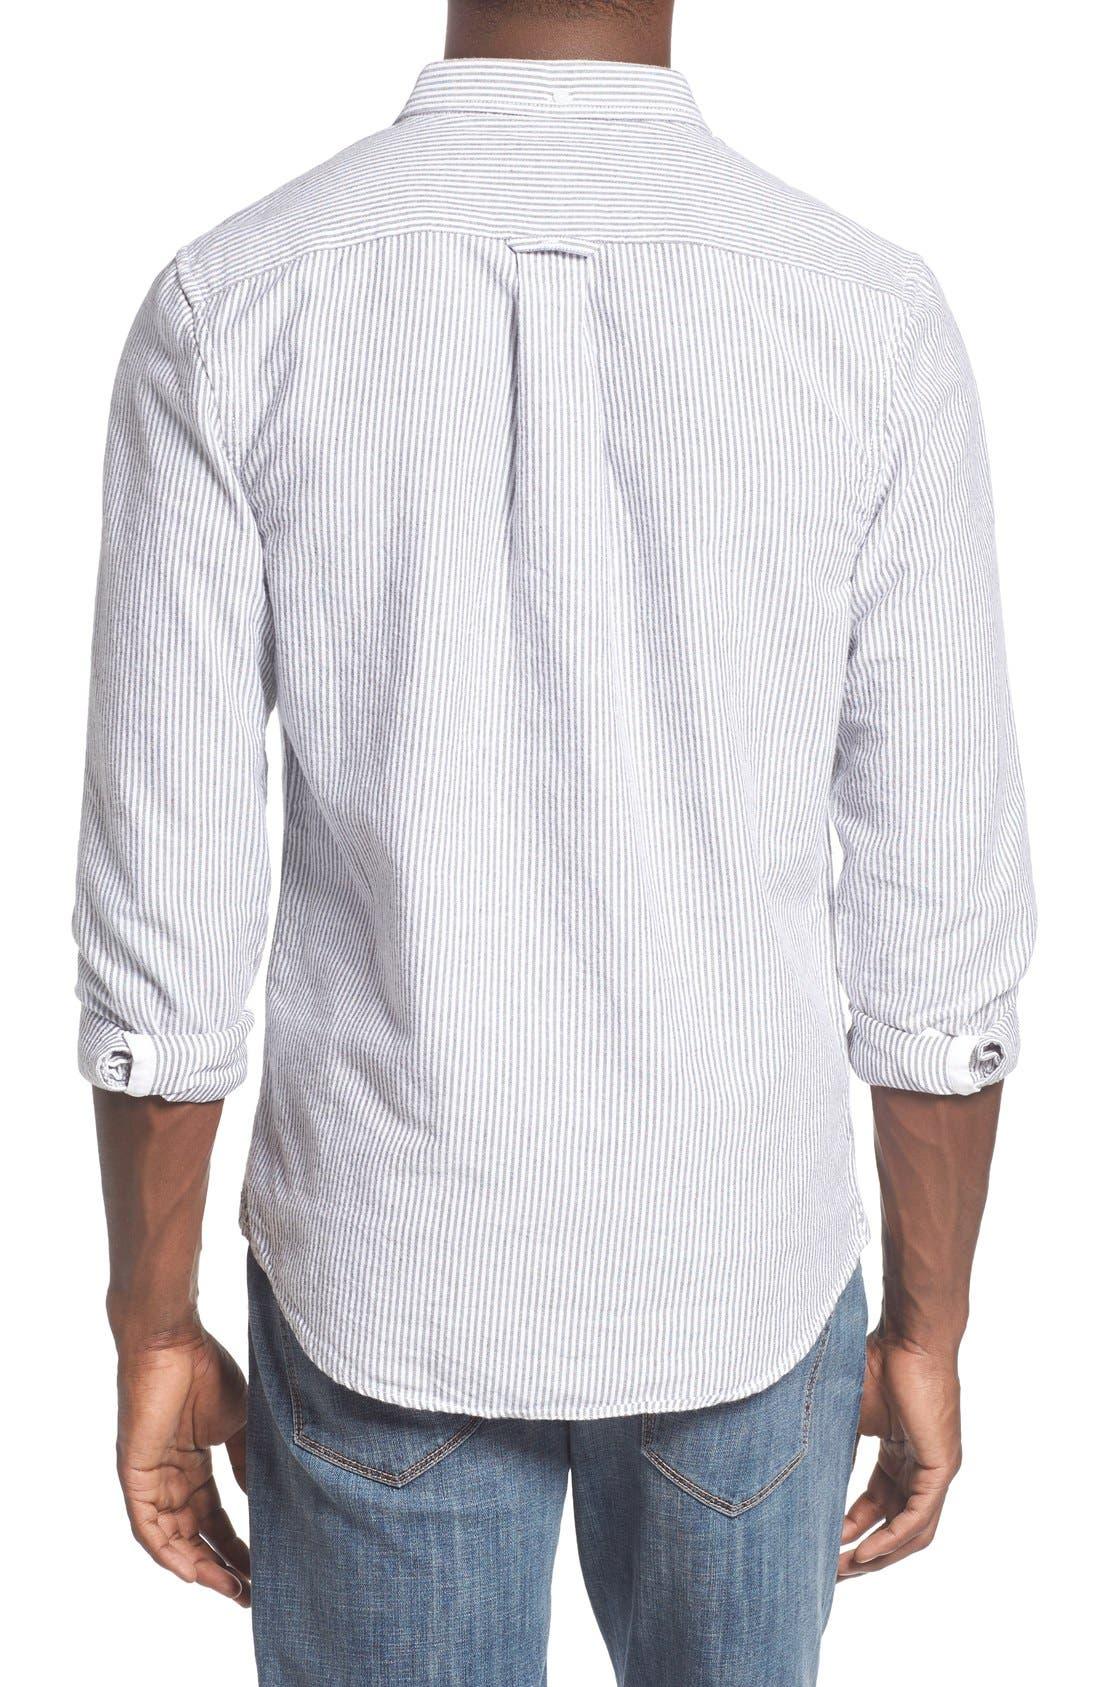 'Baker' Slim Fit Oxford Shirt,                             Alternate thumbnail 2, color,                             001